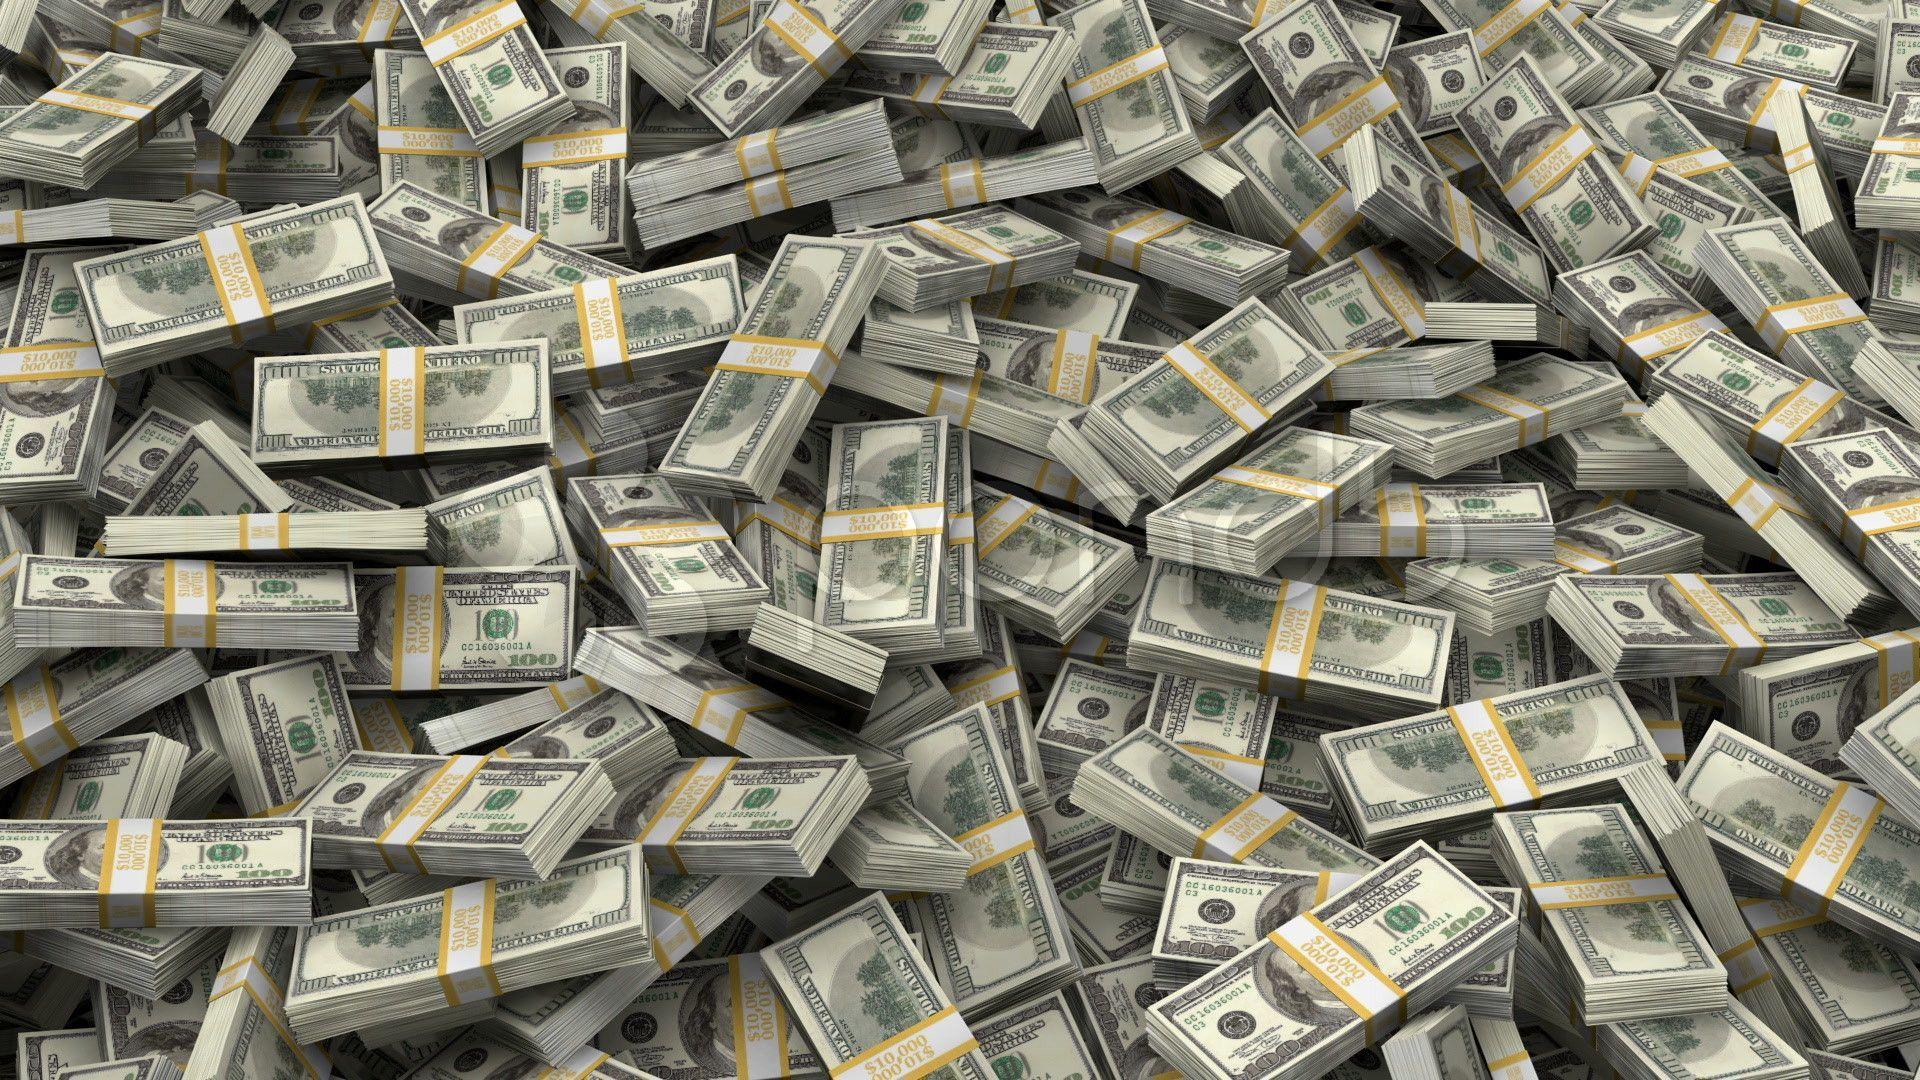 Stacks Of Money Wallpapers Top Free Stacks Of Money